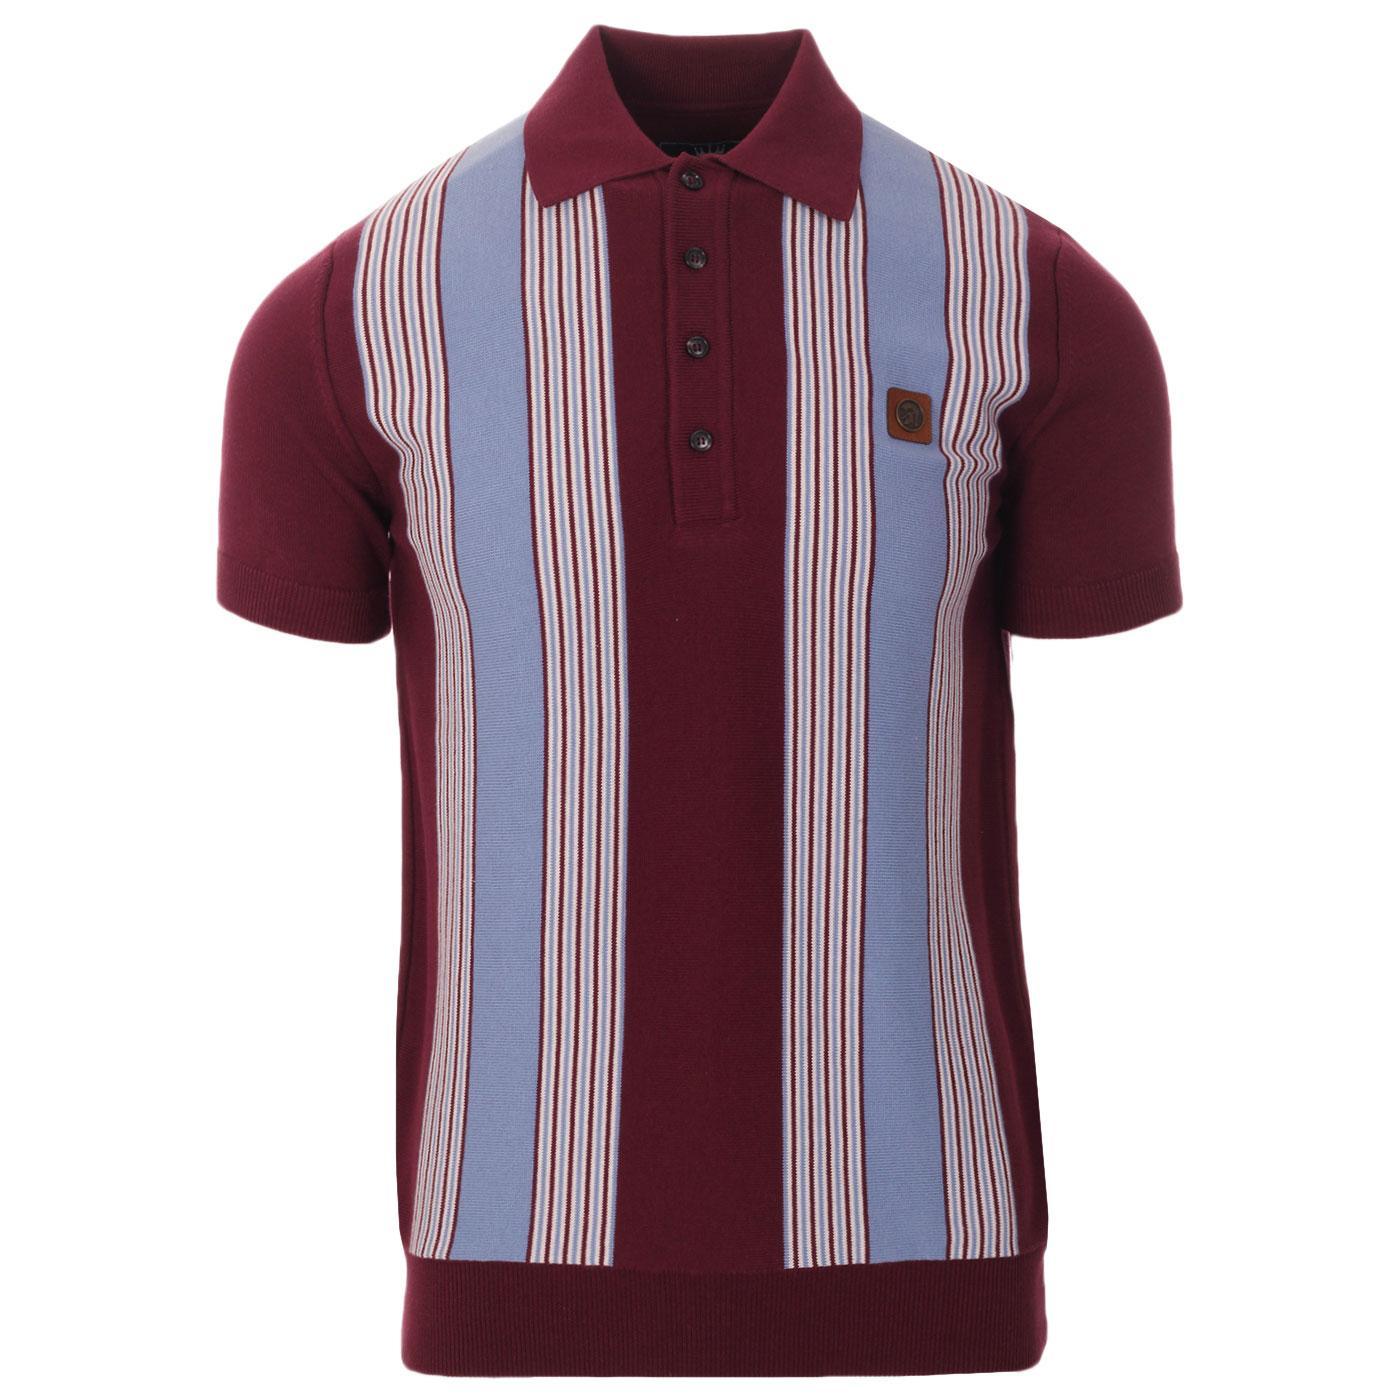 TROJAN RECORDS Ska Mod Stripe Knit Polo Top (Port)